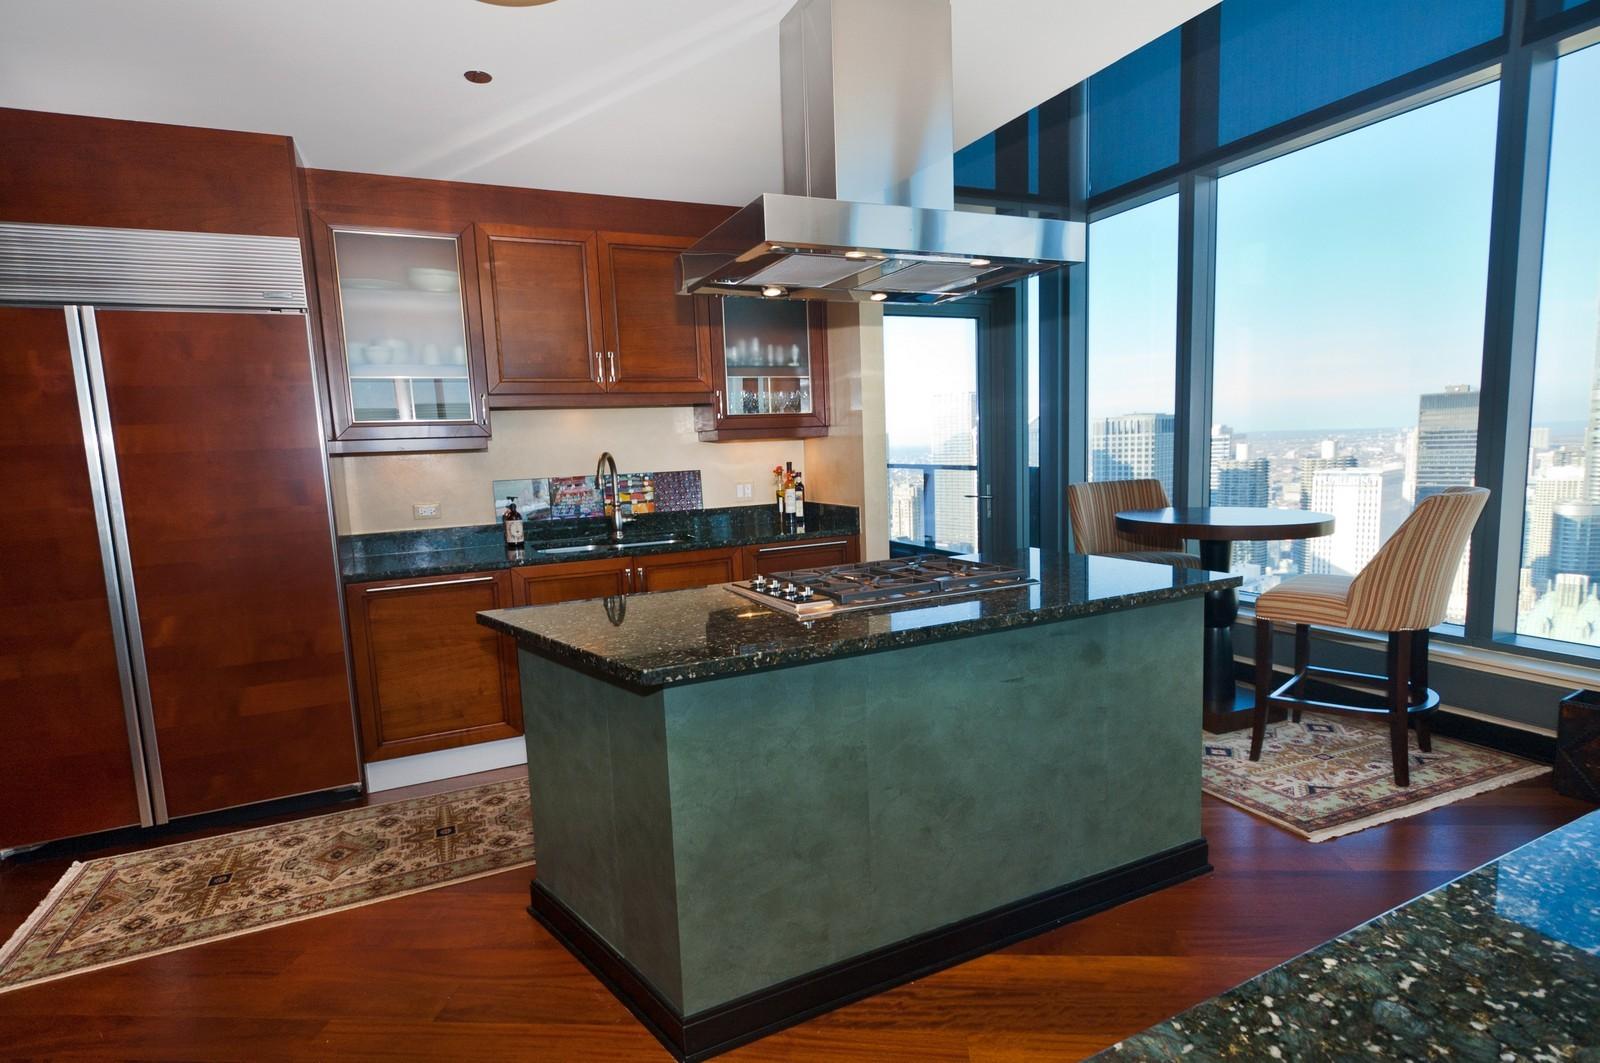 Real Estate Photography - 60 E. Monroe, 5901, Chicago, IL, 60603 - Kitchen 2